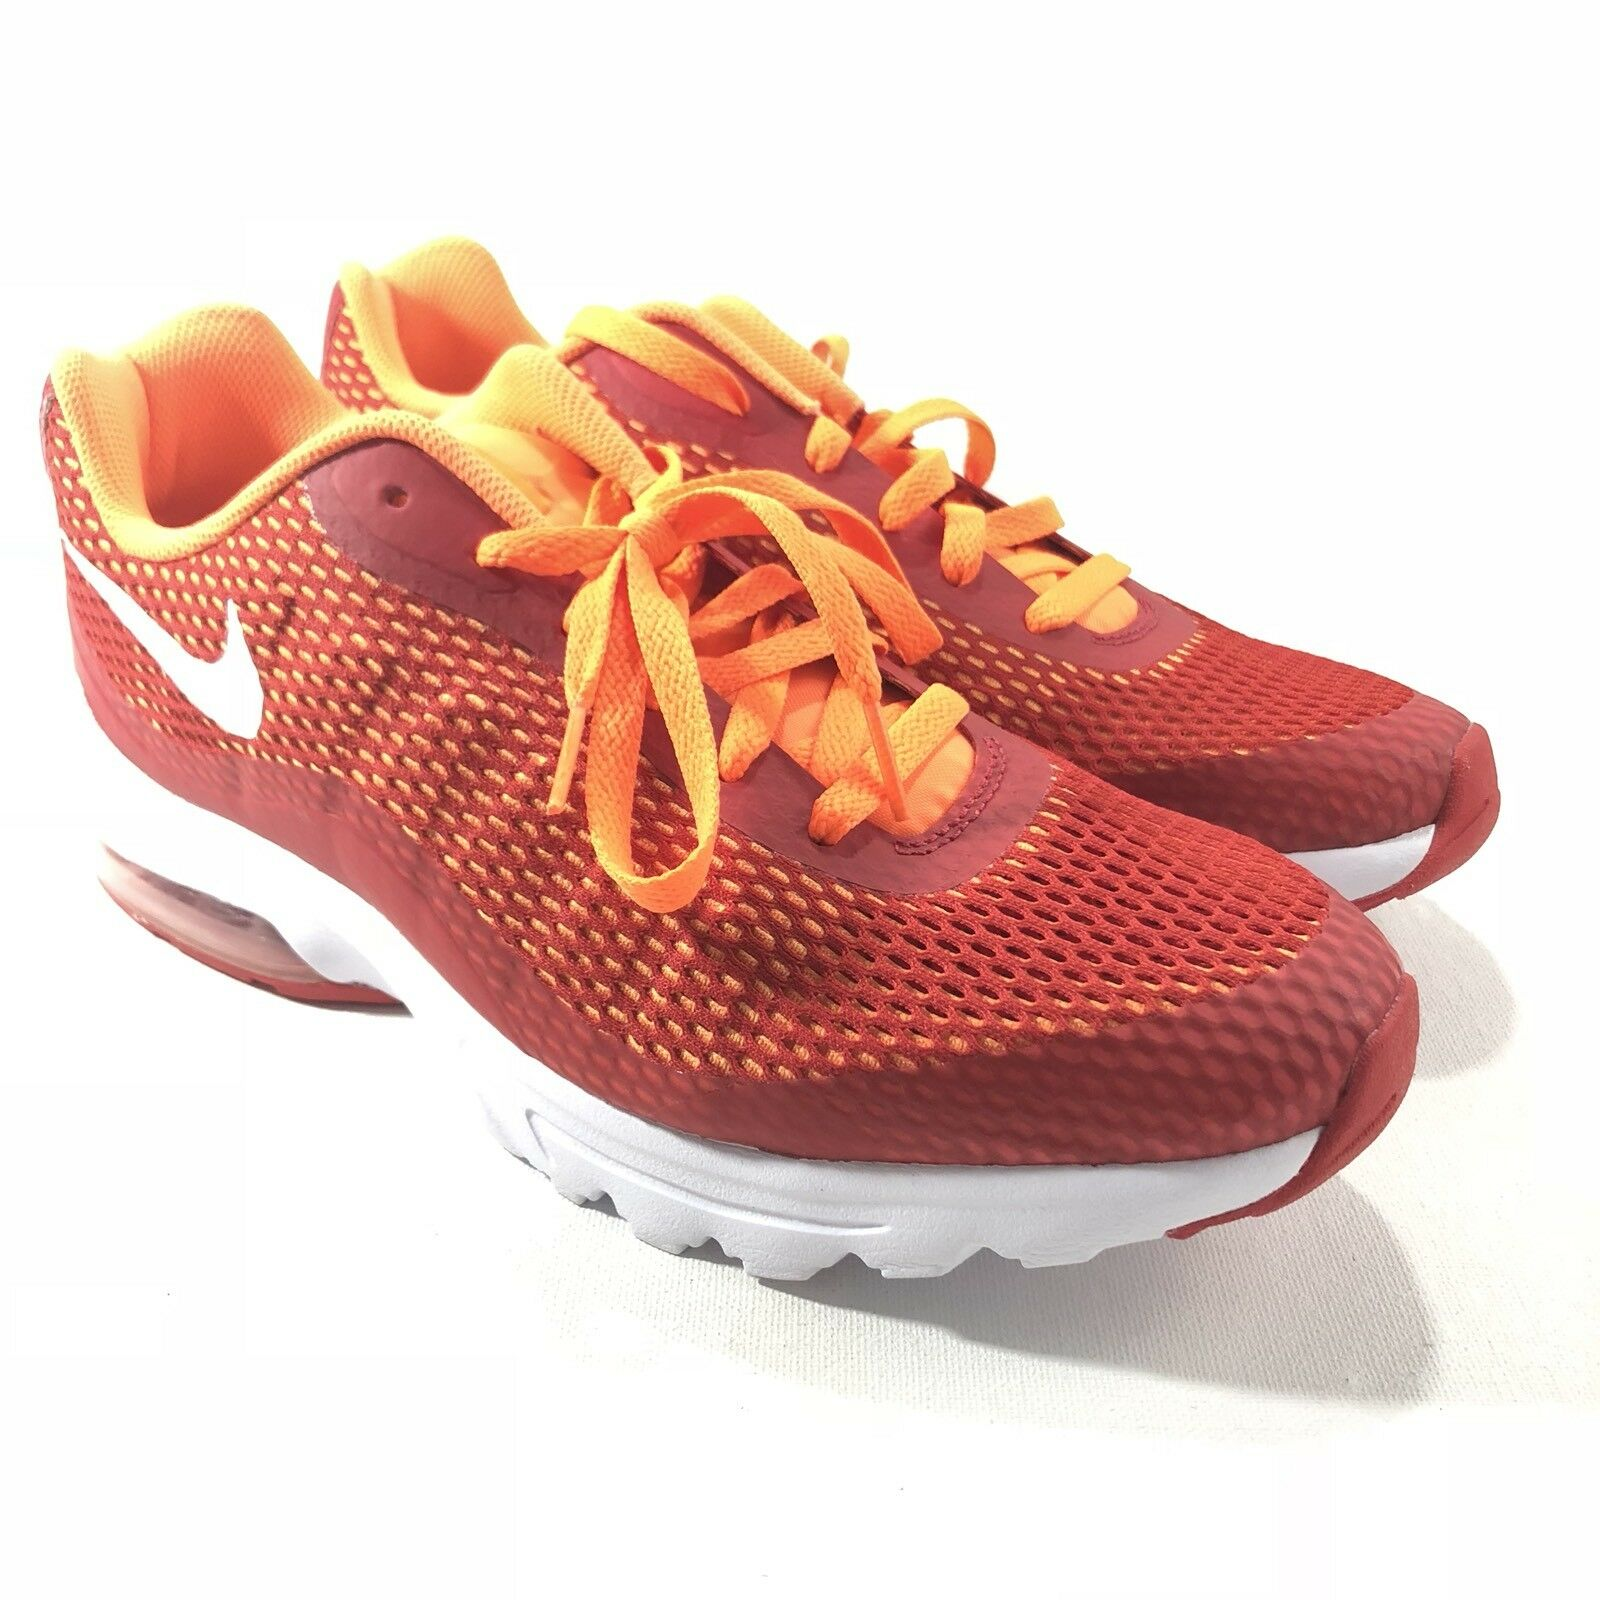 Nike Mens Air Max Invigor SE Running Shoes Red Orange White 870614-601 Size 11